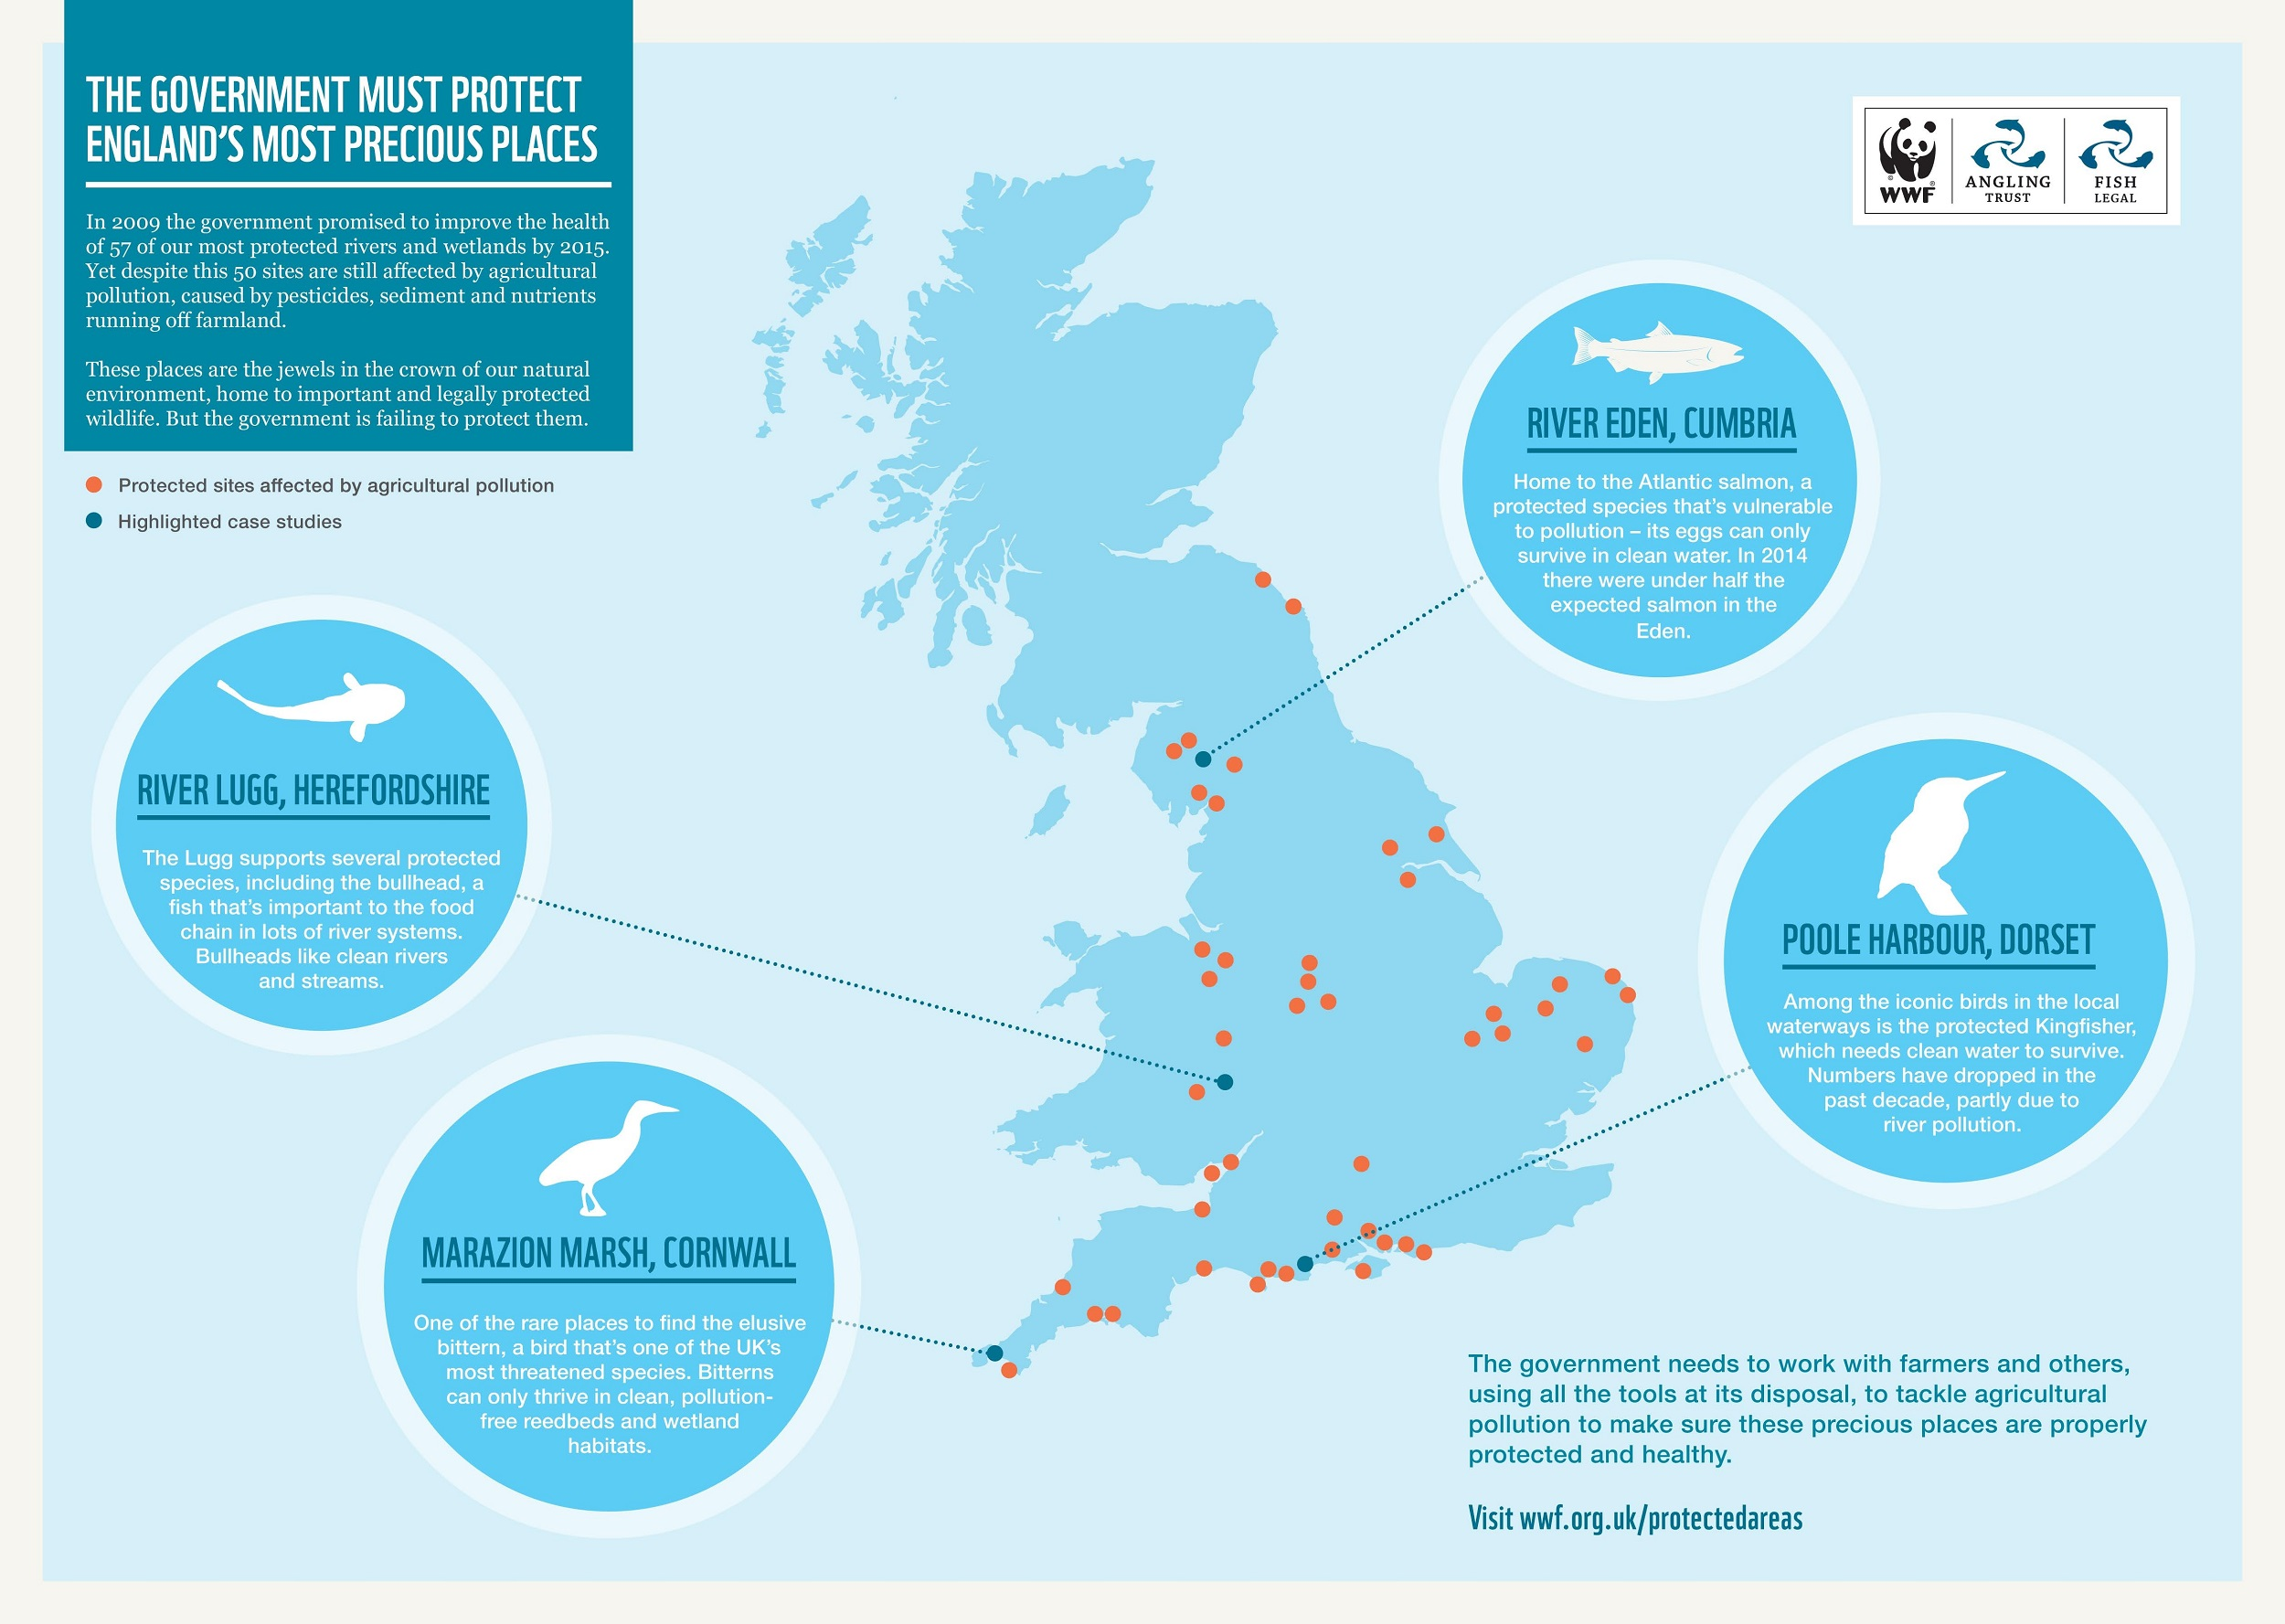 WWF to sue UK Gov